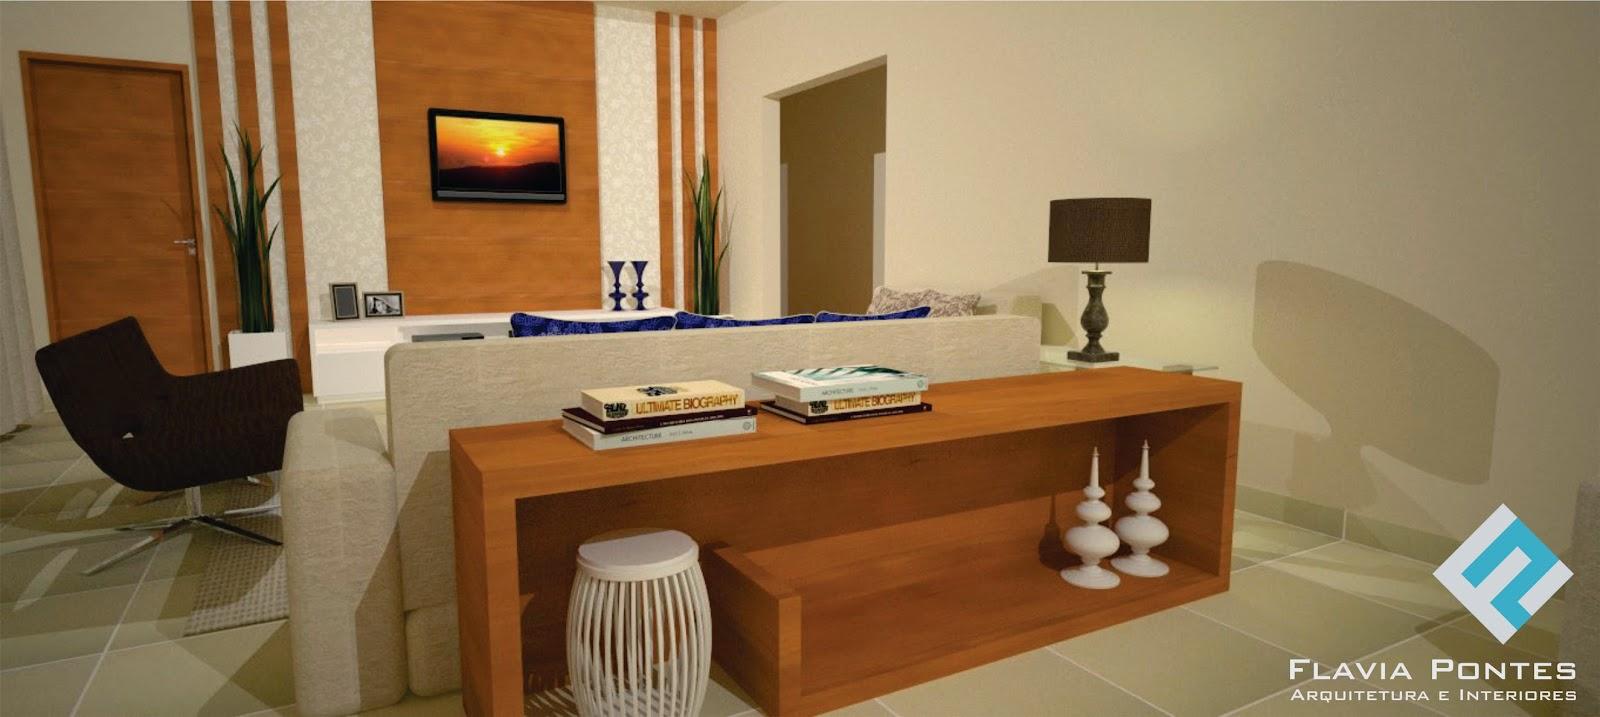 Dois Ambientes Sala De Estar E Tv ~ terçafeira, 16 de dezembro de 2014